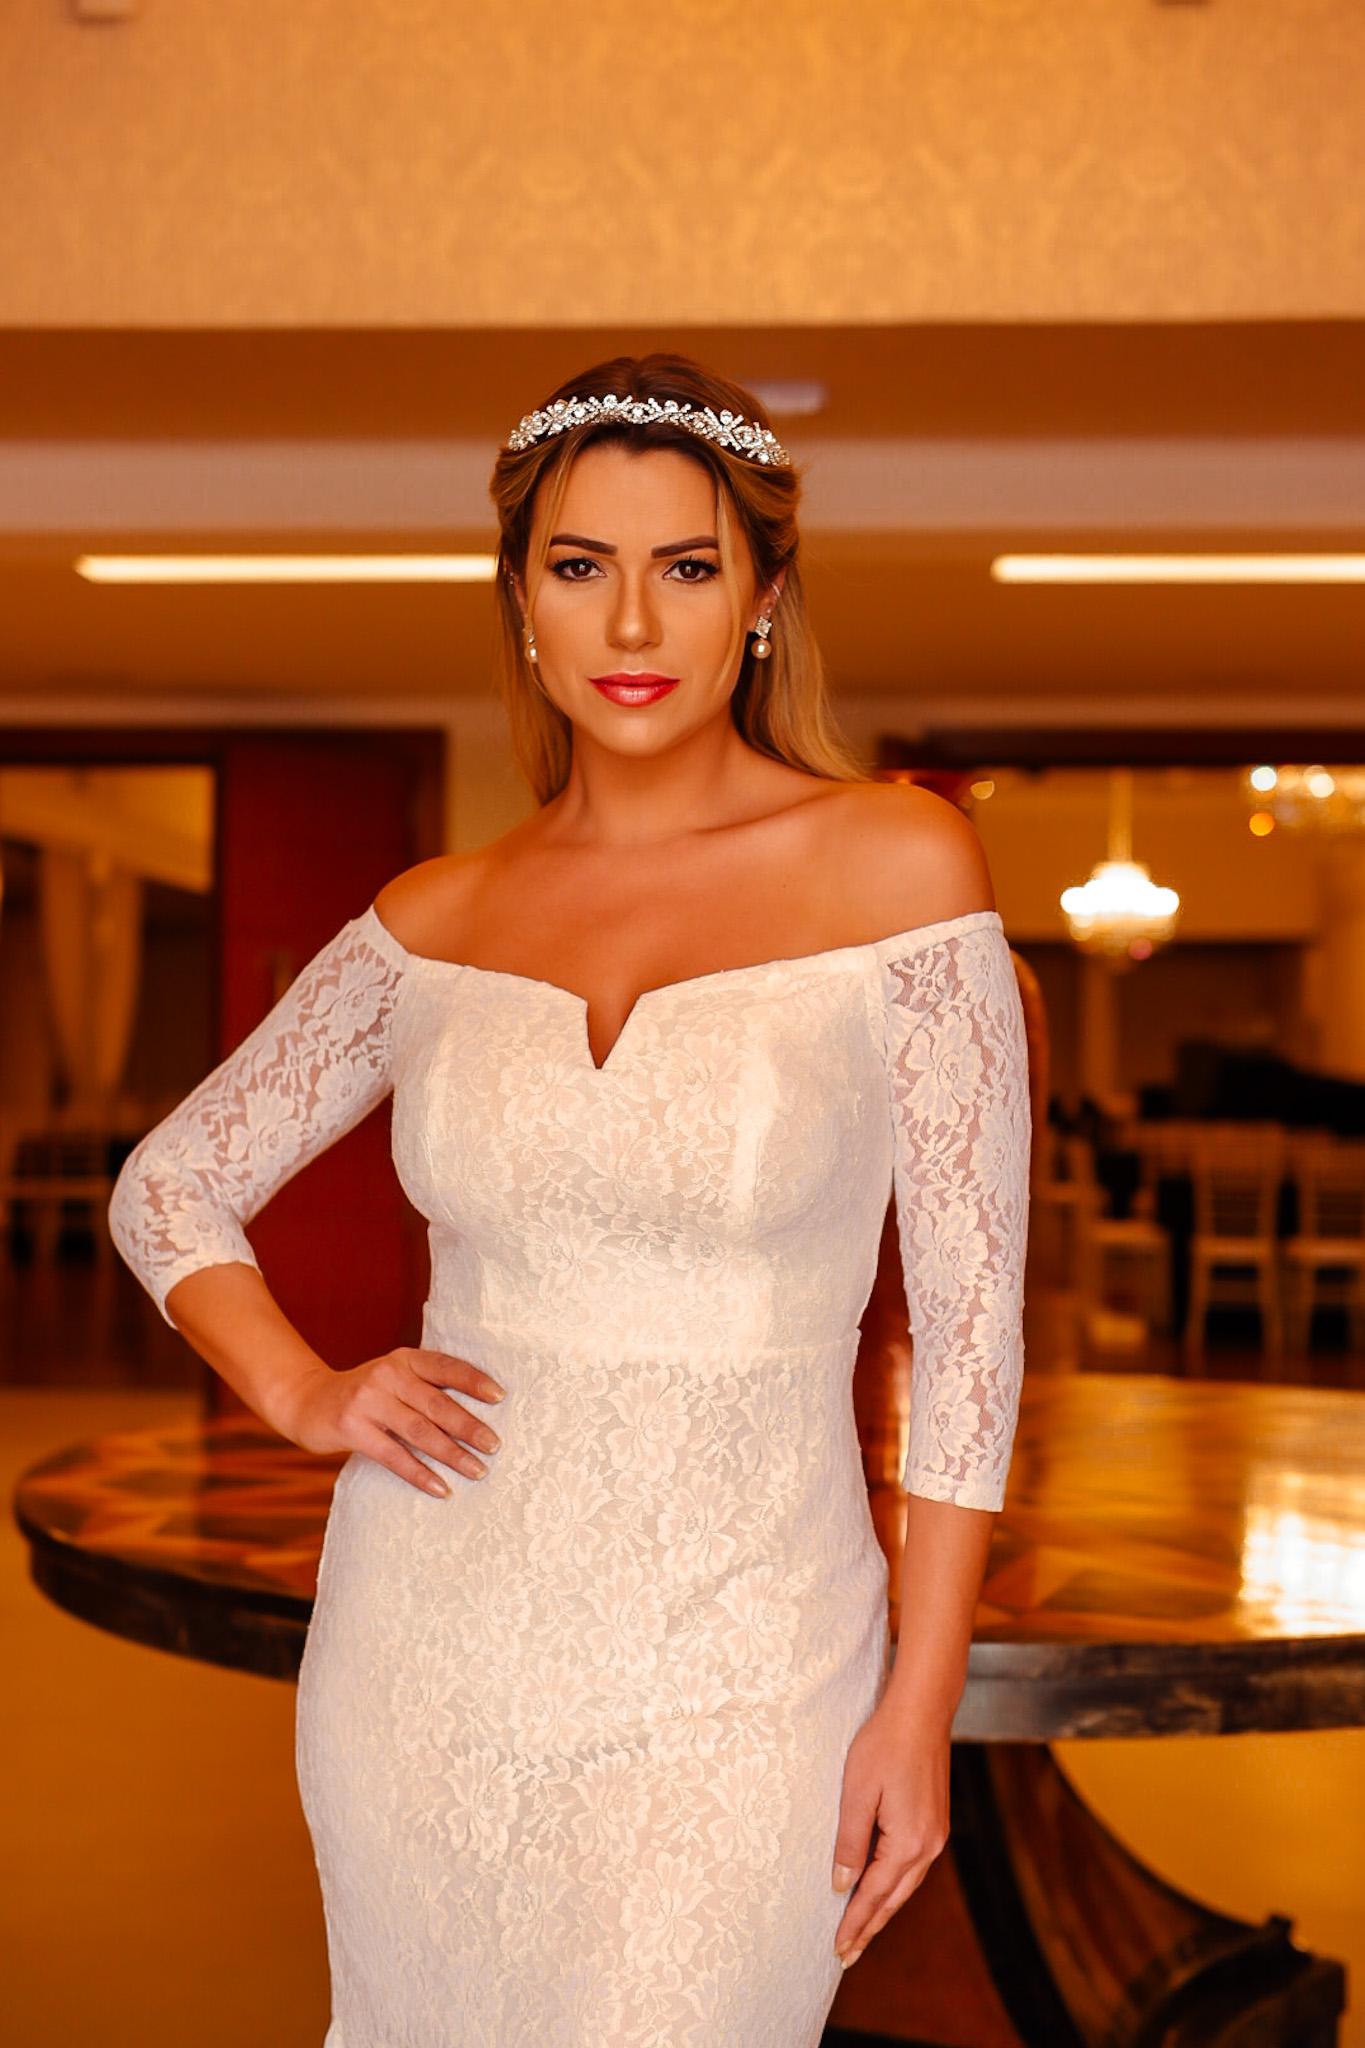 Lucila usando tiara de noiva